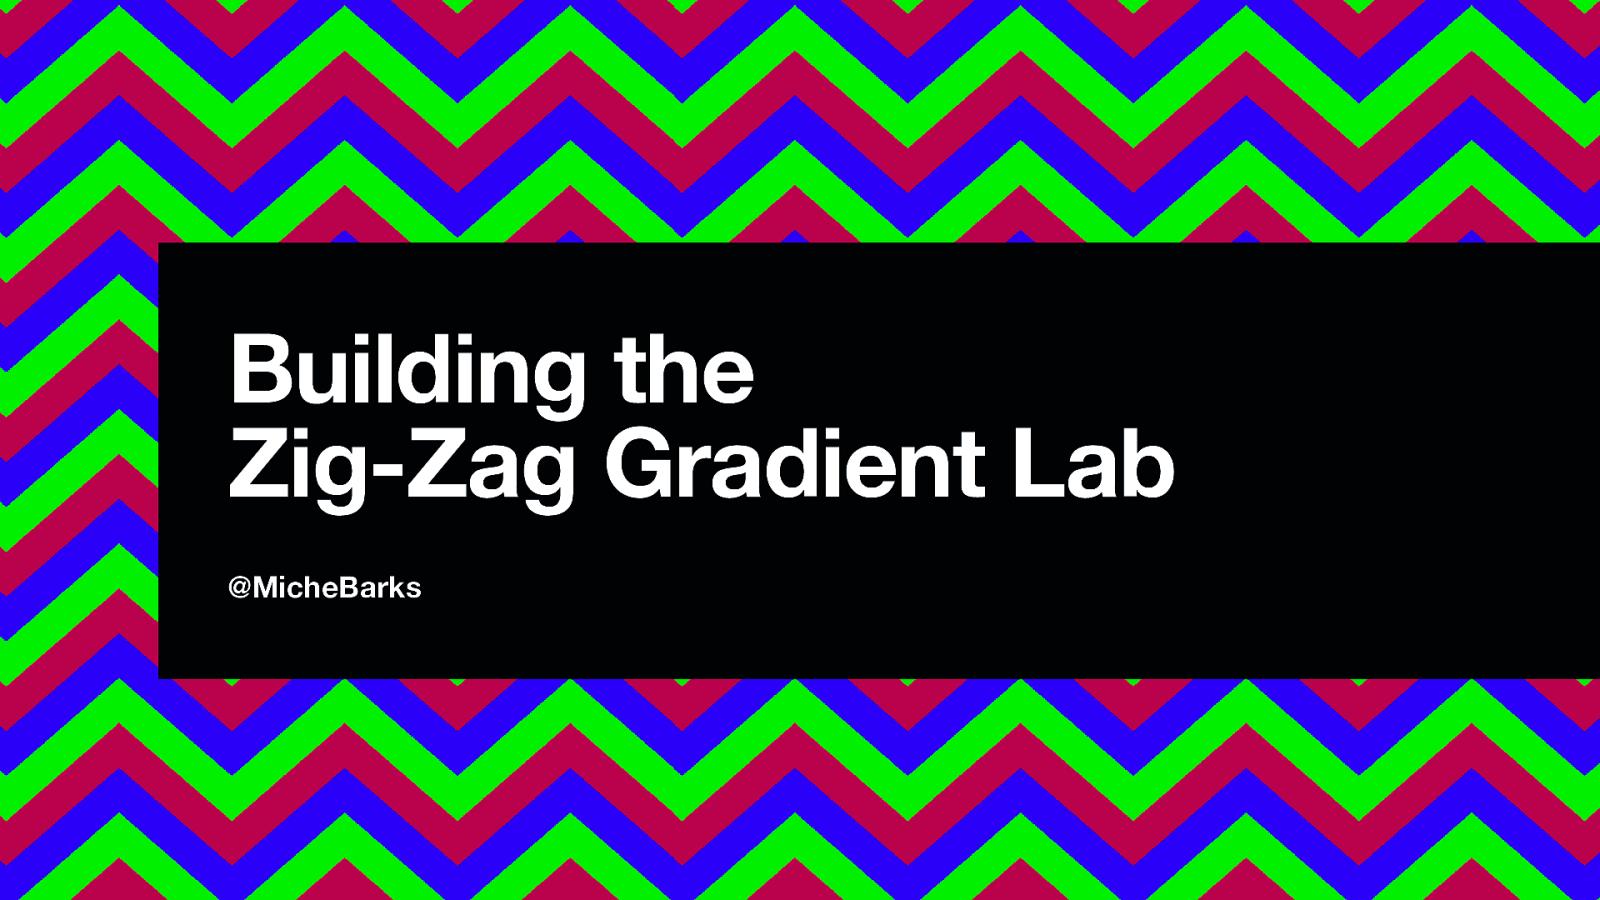 Building the Zig-Zag Gradient Lab